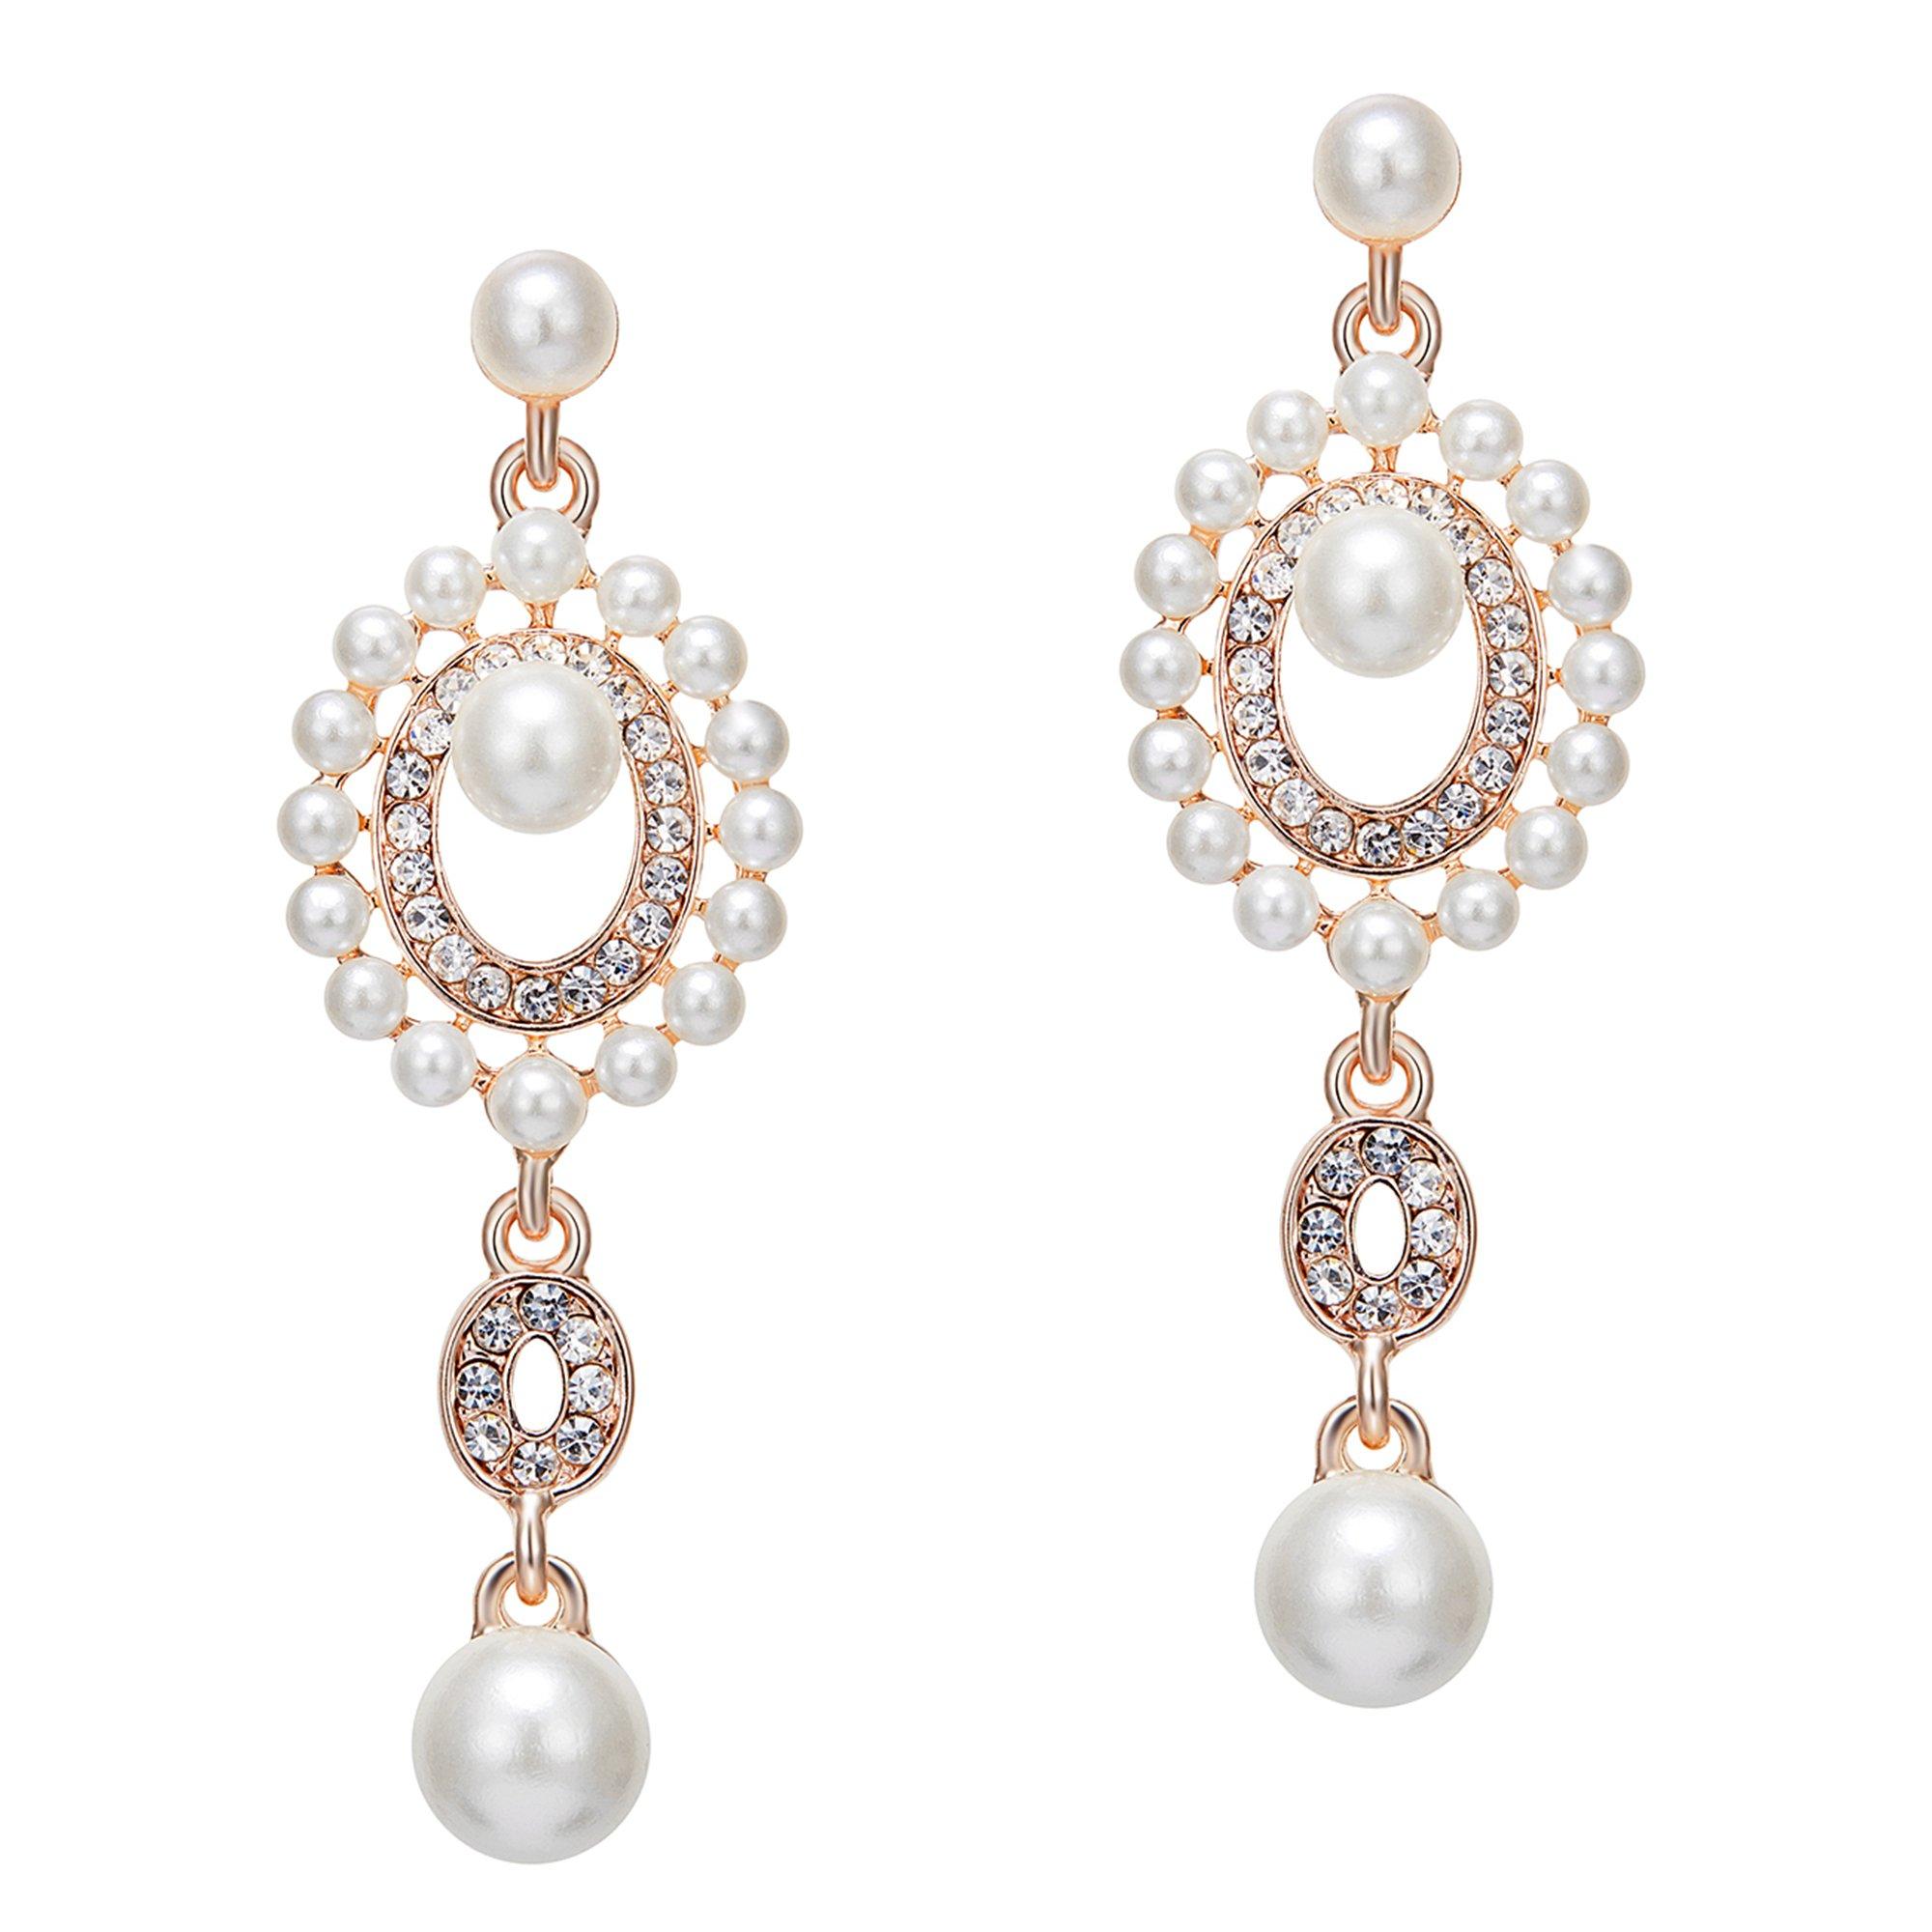 BABEYOND 1920s Vintage Wedding Pearl Dangle Drop Earrings Art Deco Gatsby Earrings (Style 6-Rose Gold)